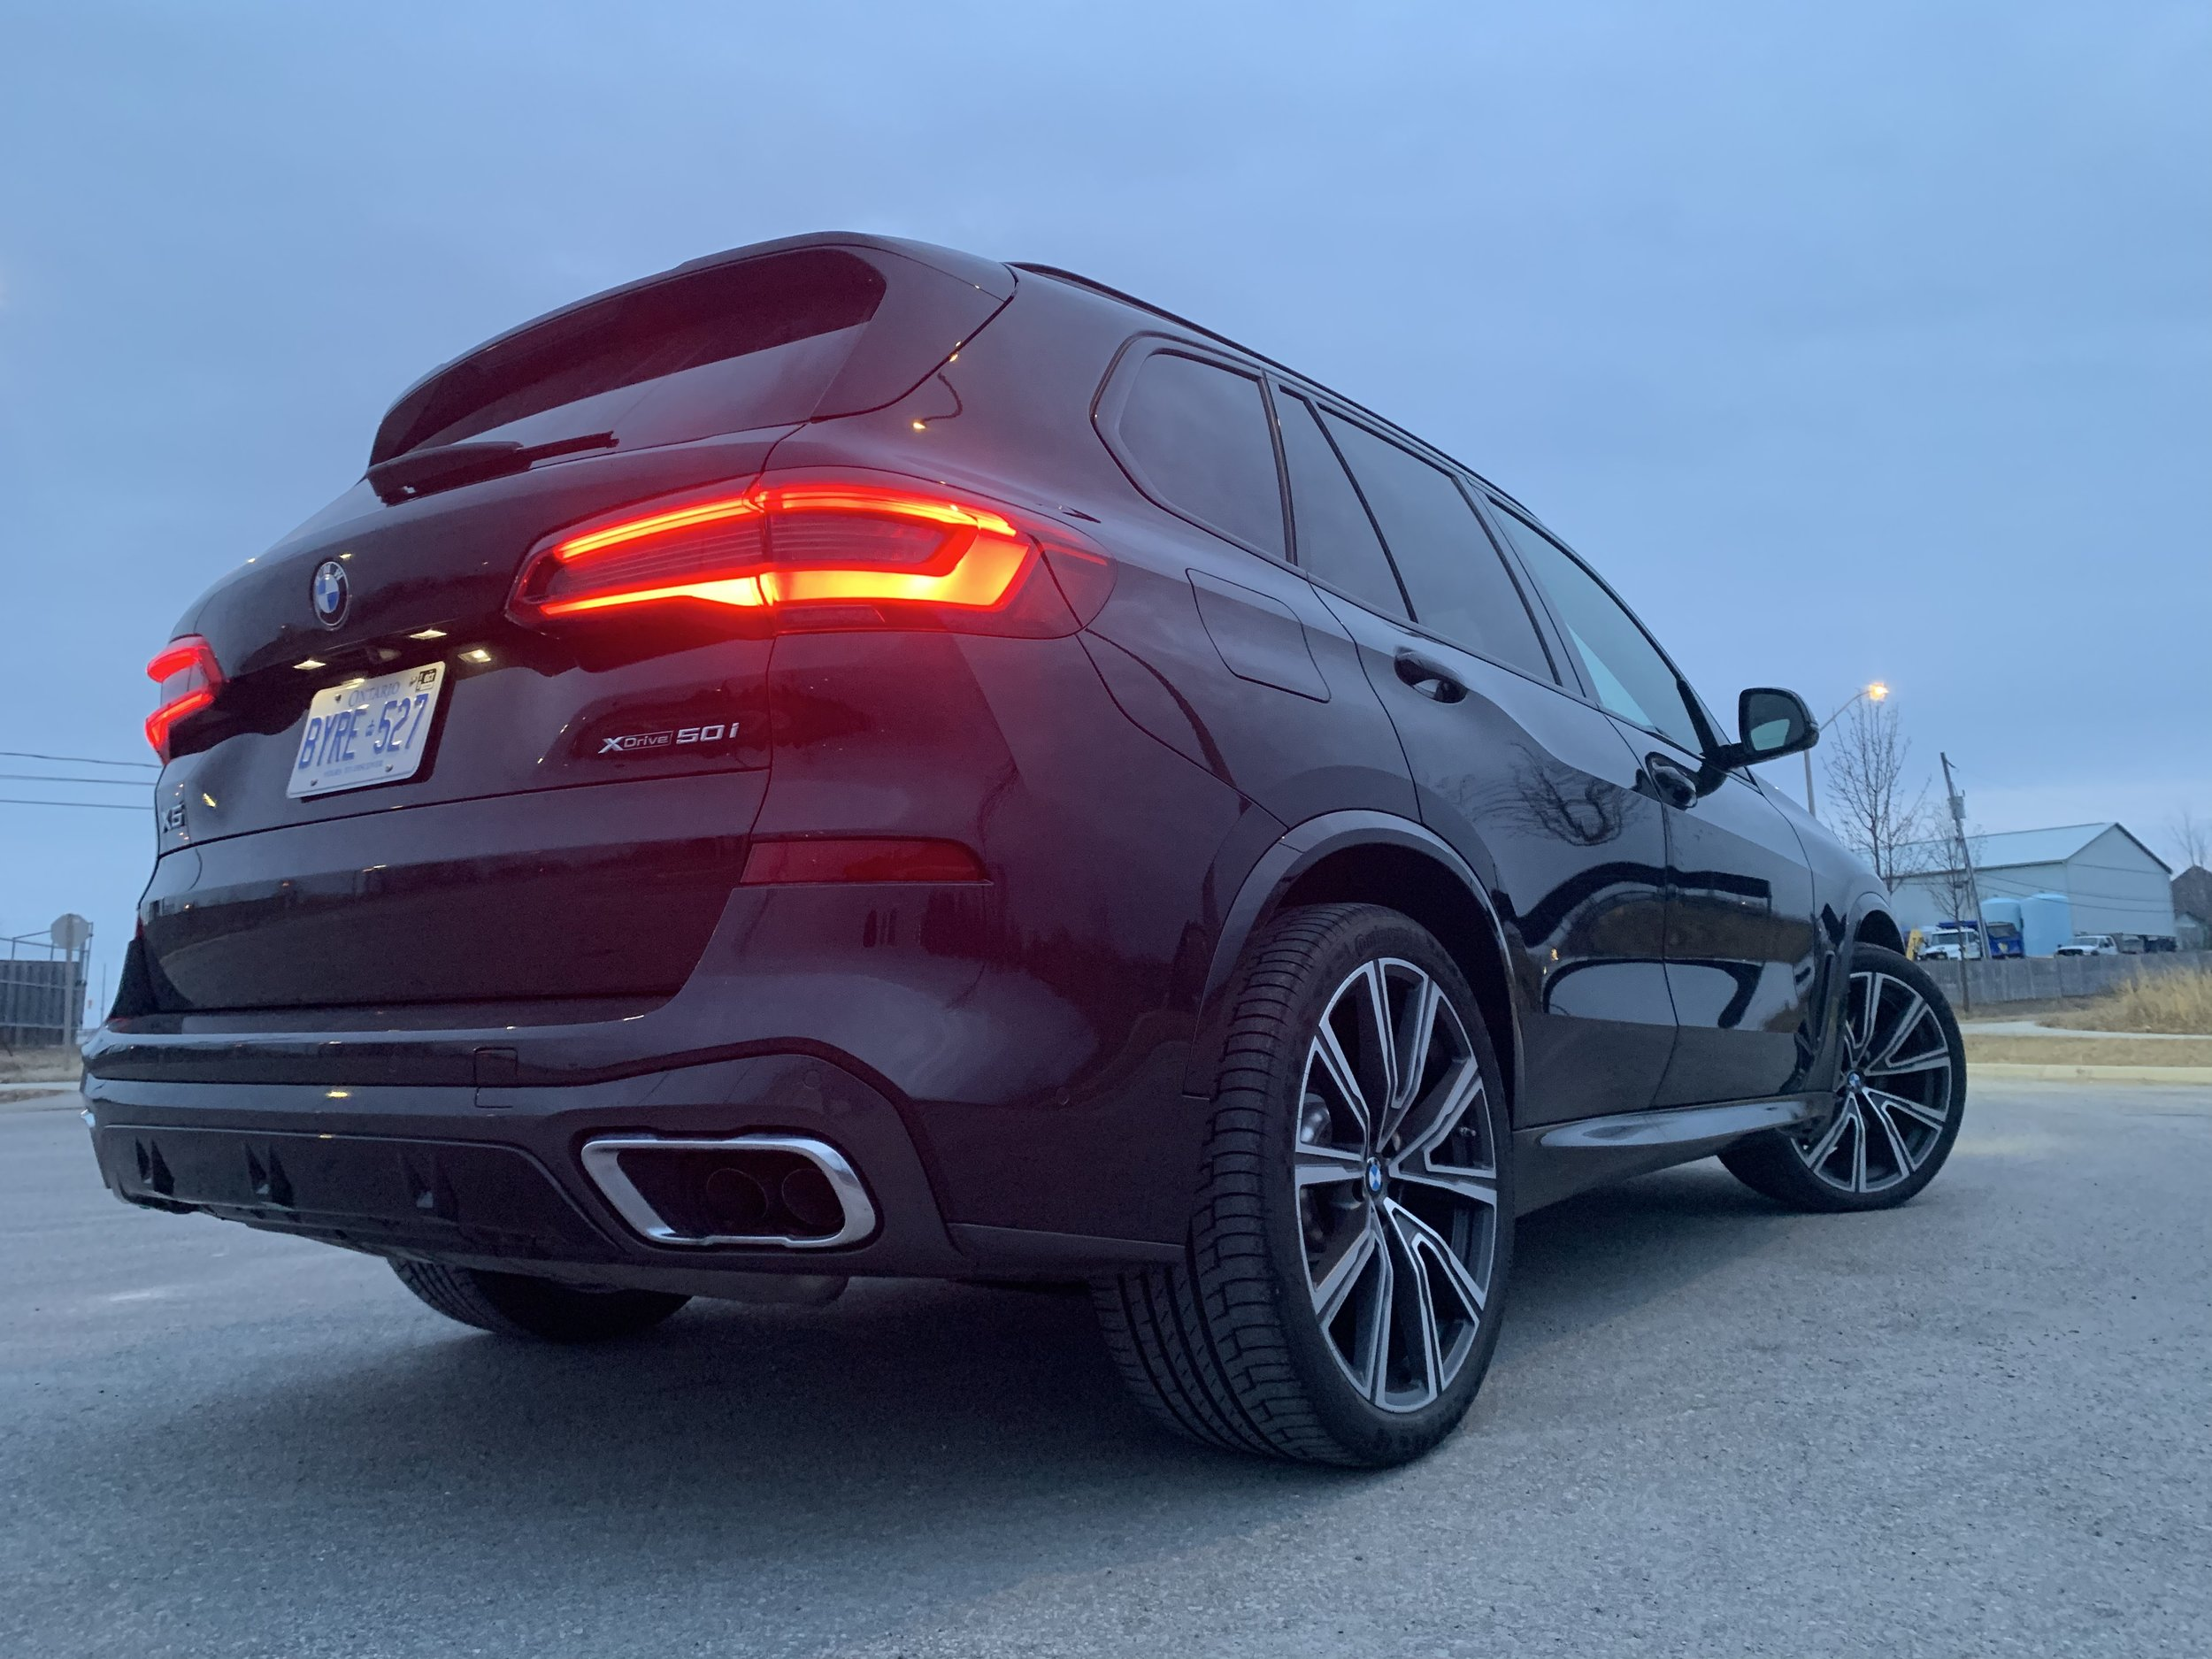 2019 BMW X5 Modern Mississauga Media 2.jpg